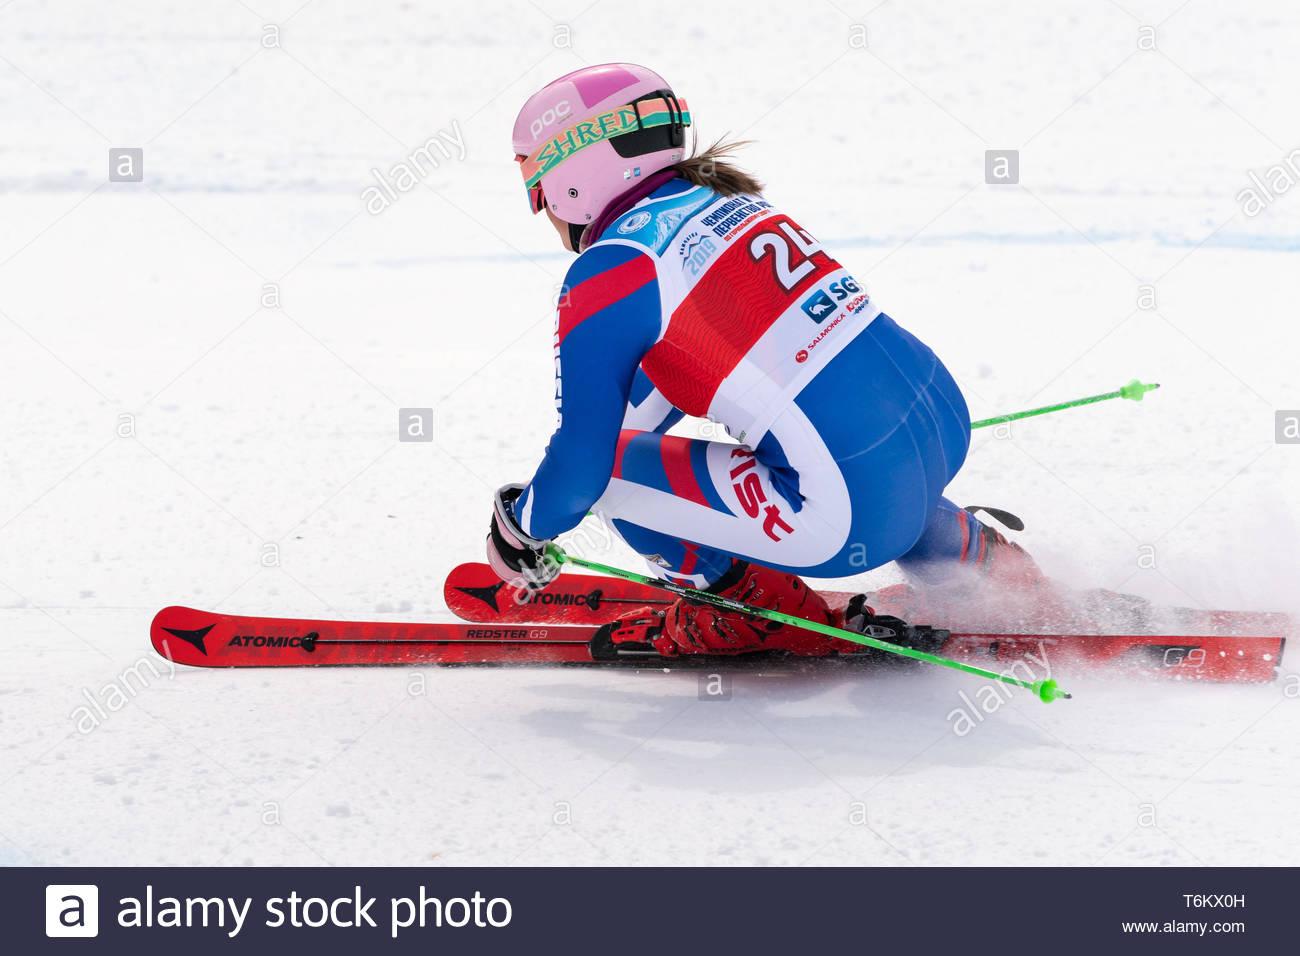 KAMCHATKA PENINSULA, RUSSIA - APR 2, 2019: Mountain skier Vitalina Girina (Moscow Region) skiing down mount. Russian Women's Alpine Skiing Cup, Intern - Stock Image